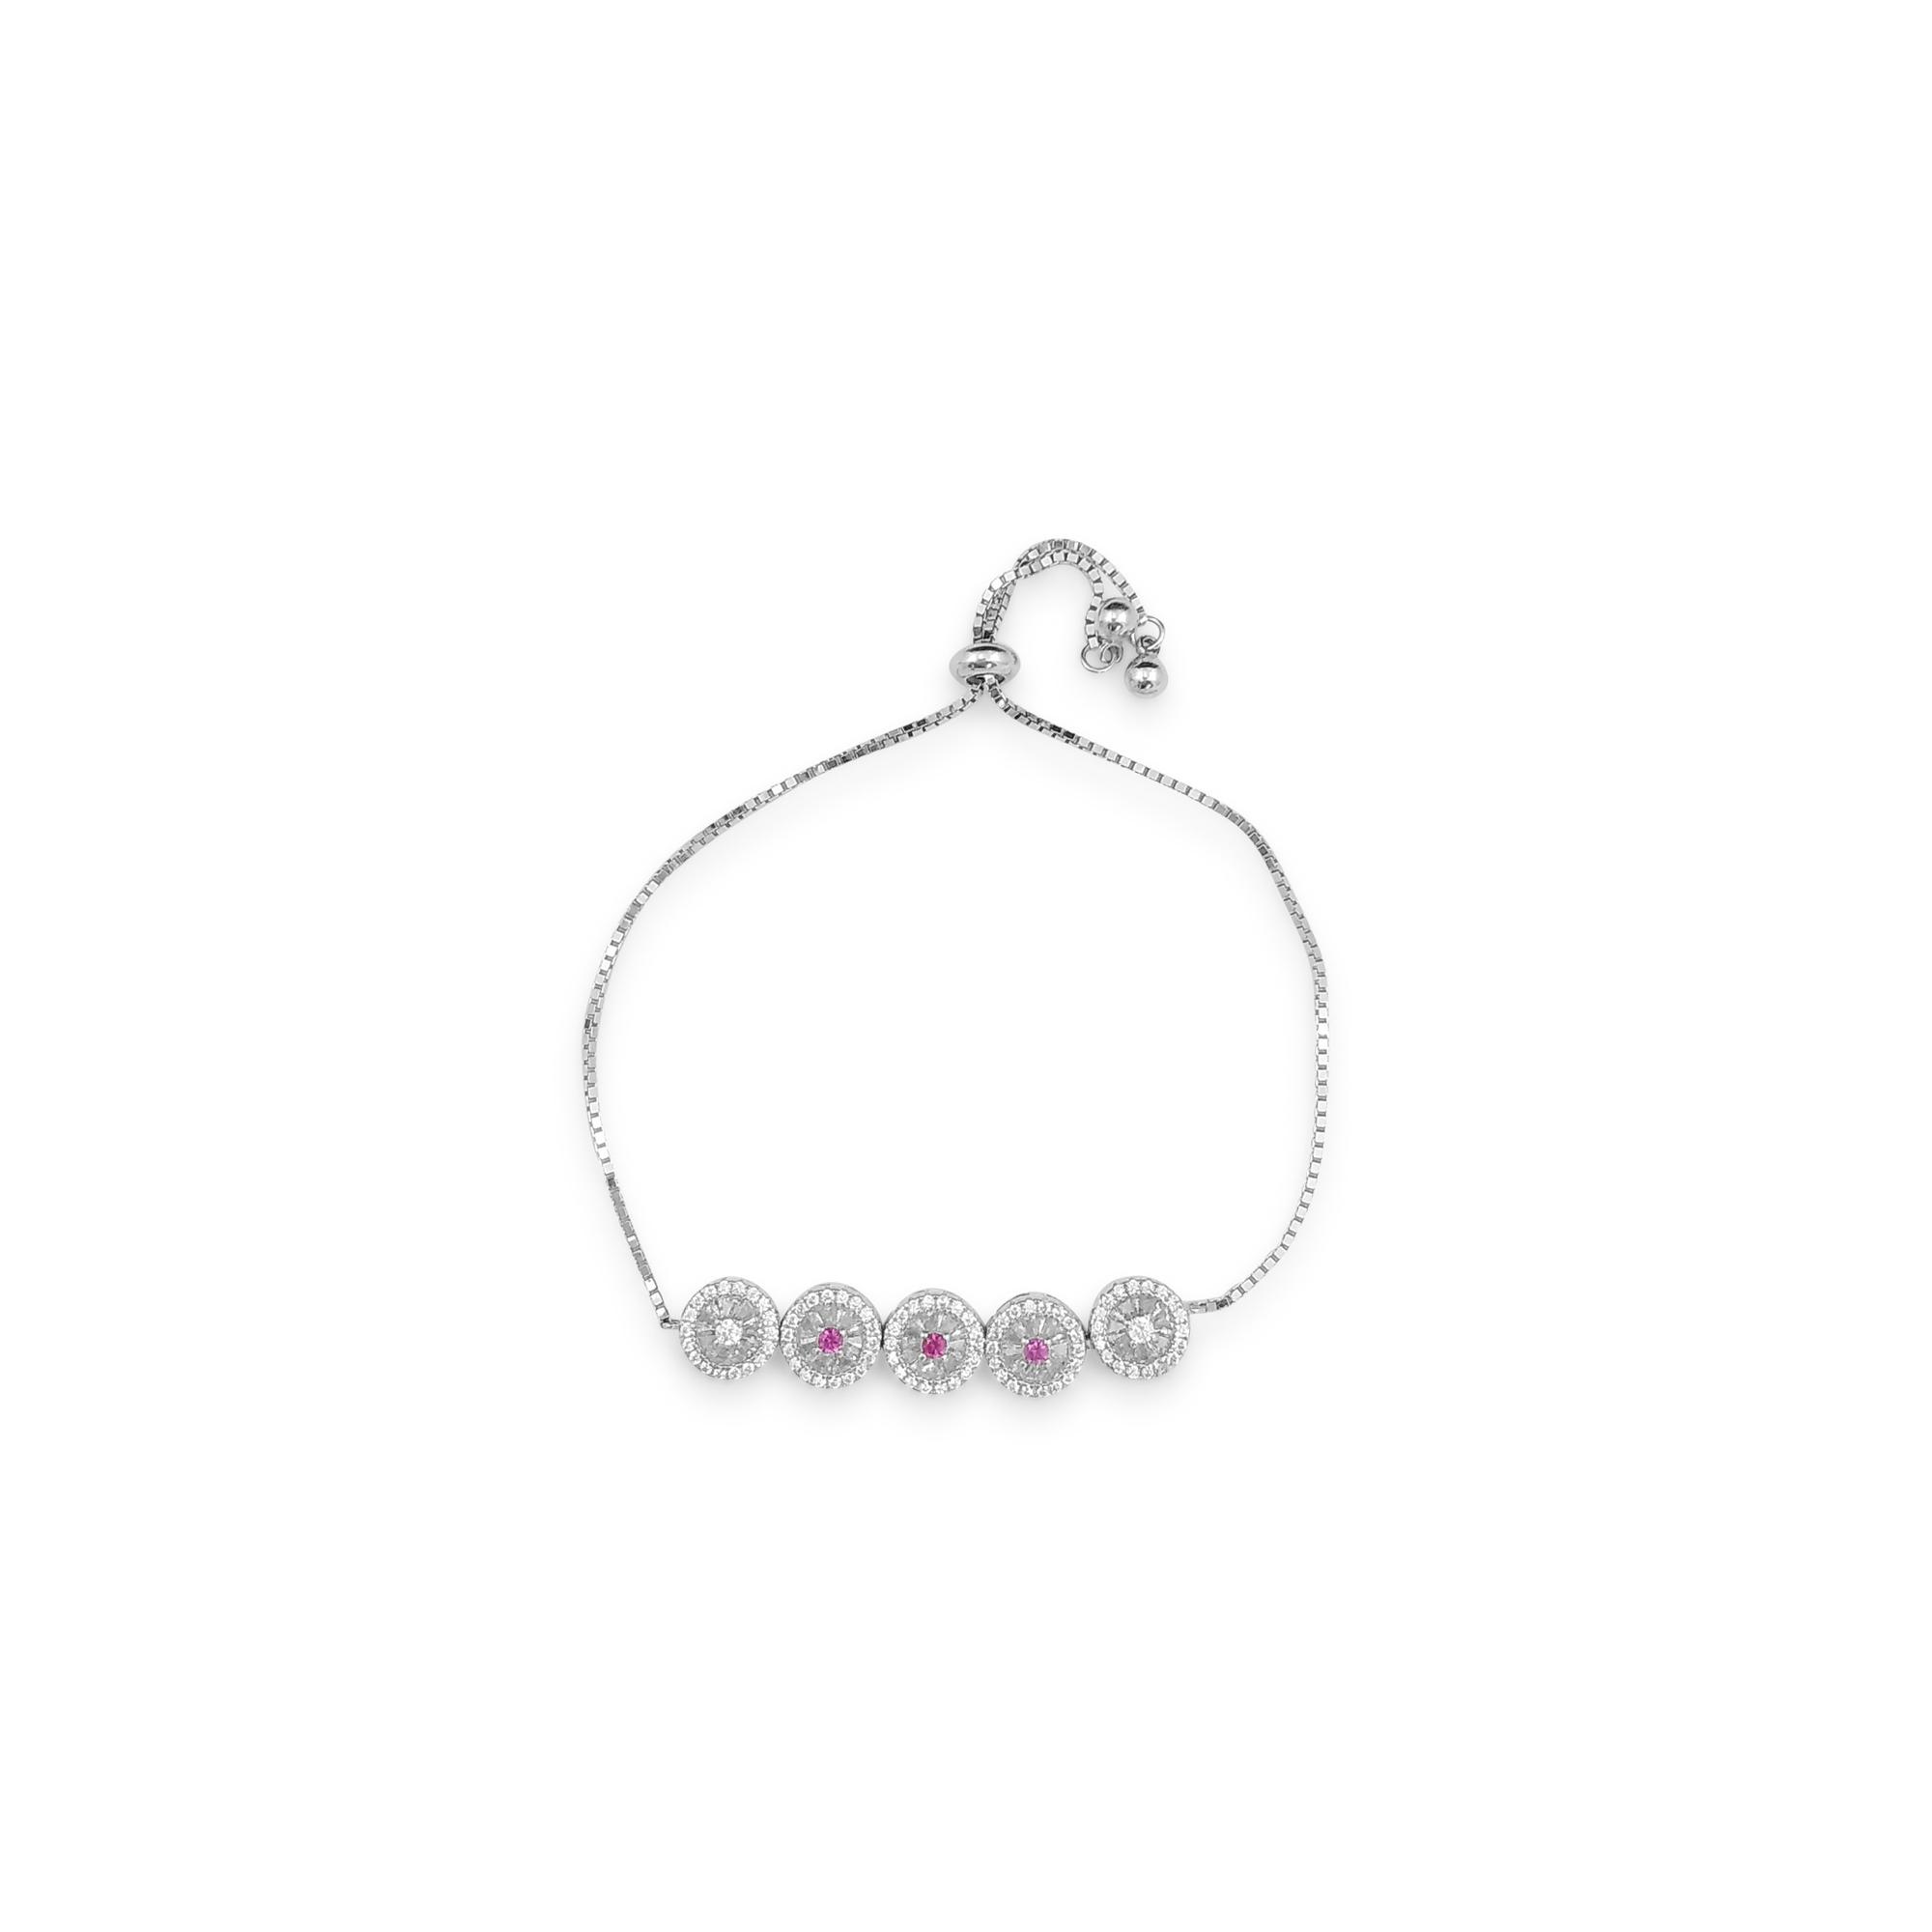 Petite Balles Bracelets